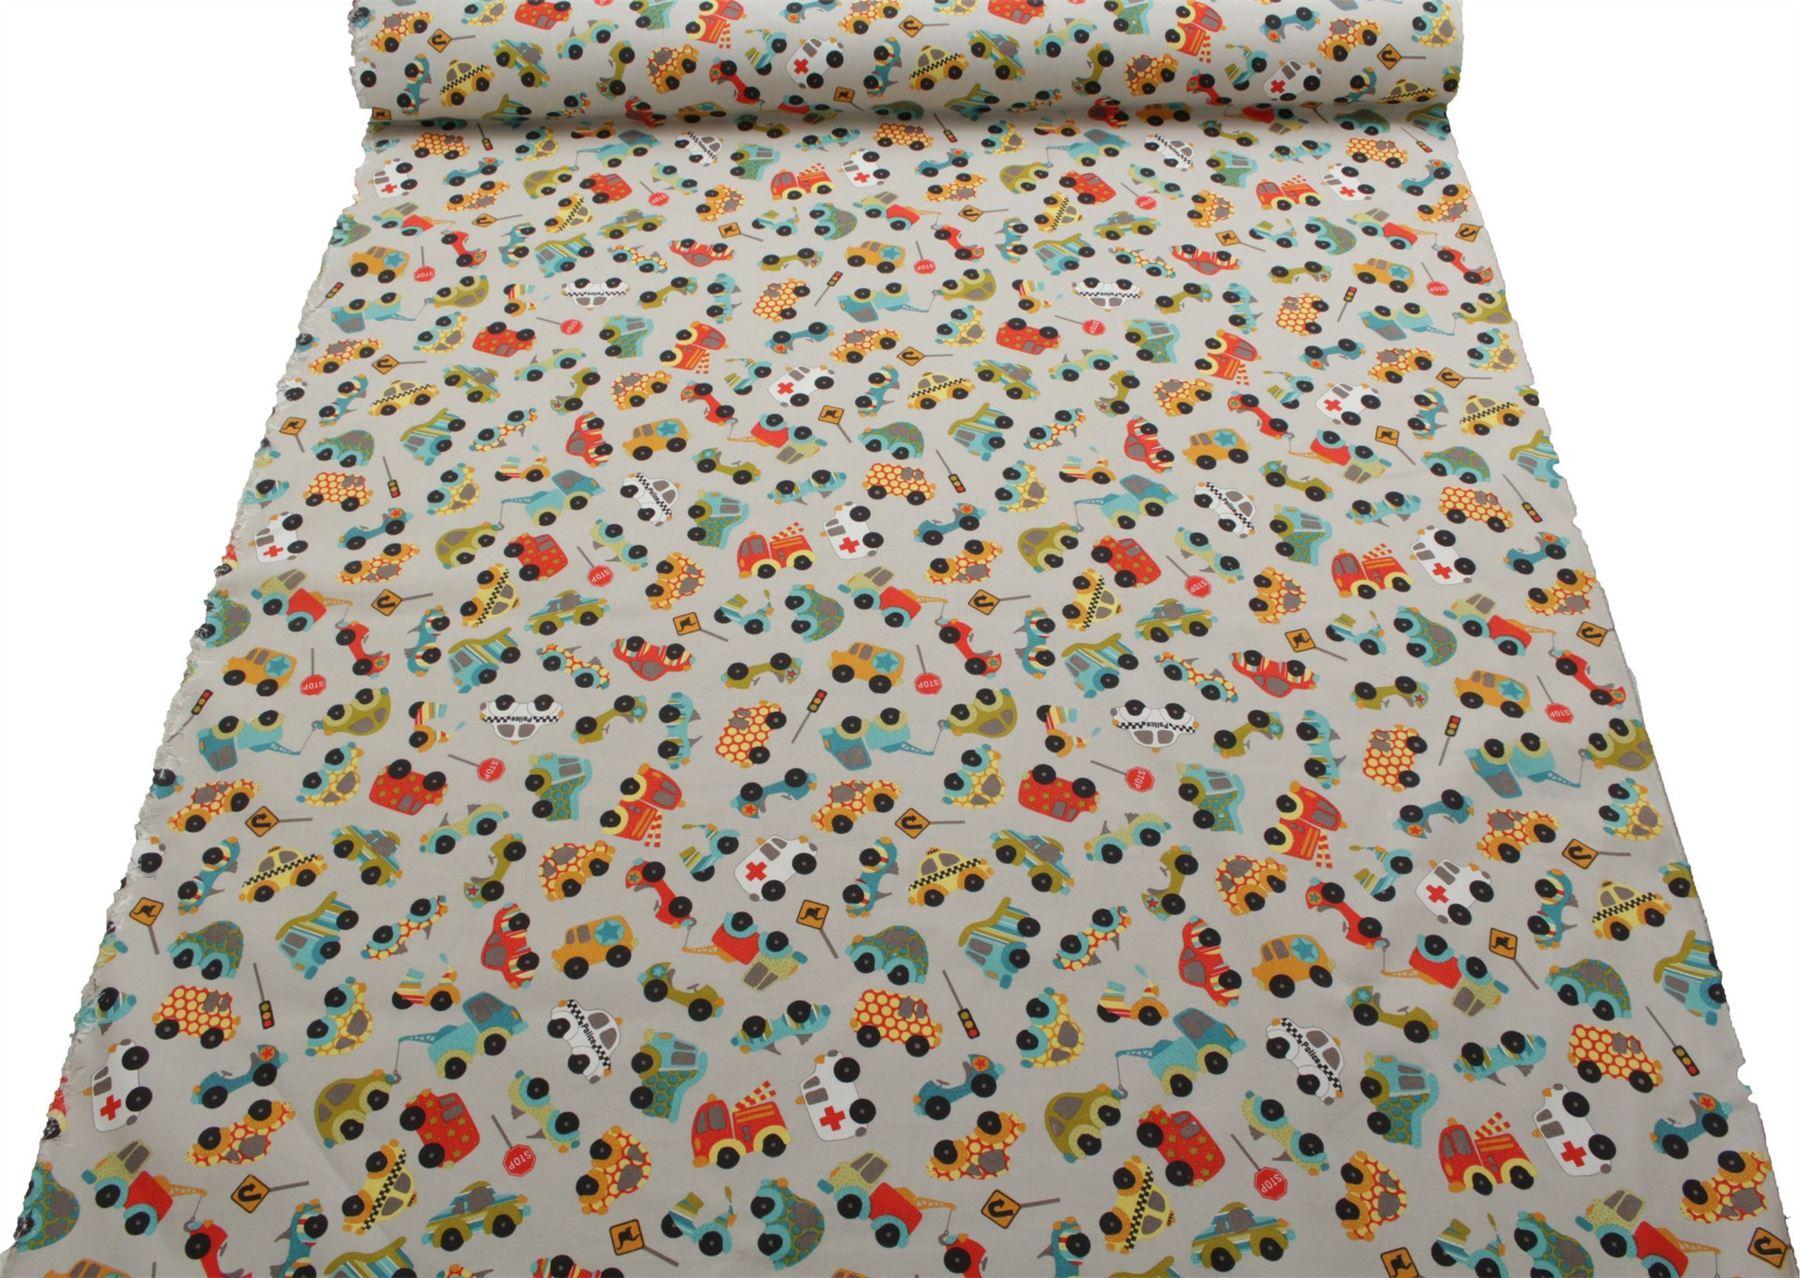 thumbnail 5 - 100% Heavy Cotton Panama Printed Childrens Curtain Cushion Upholstery Fabric